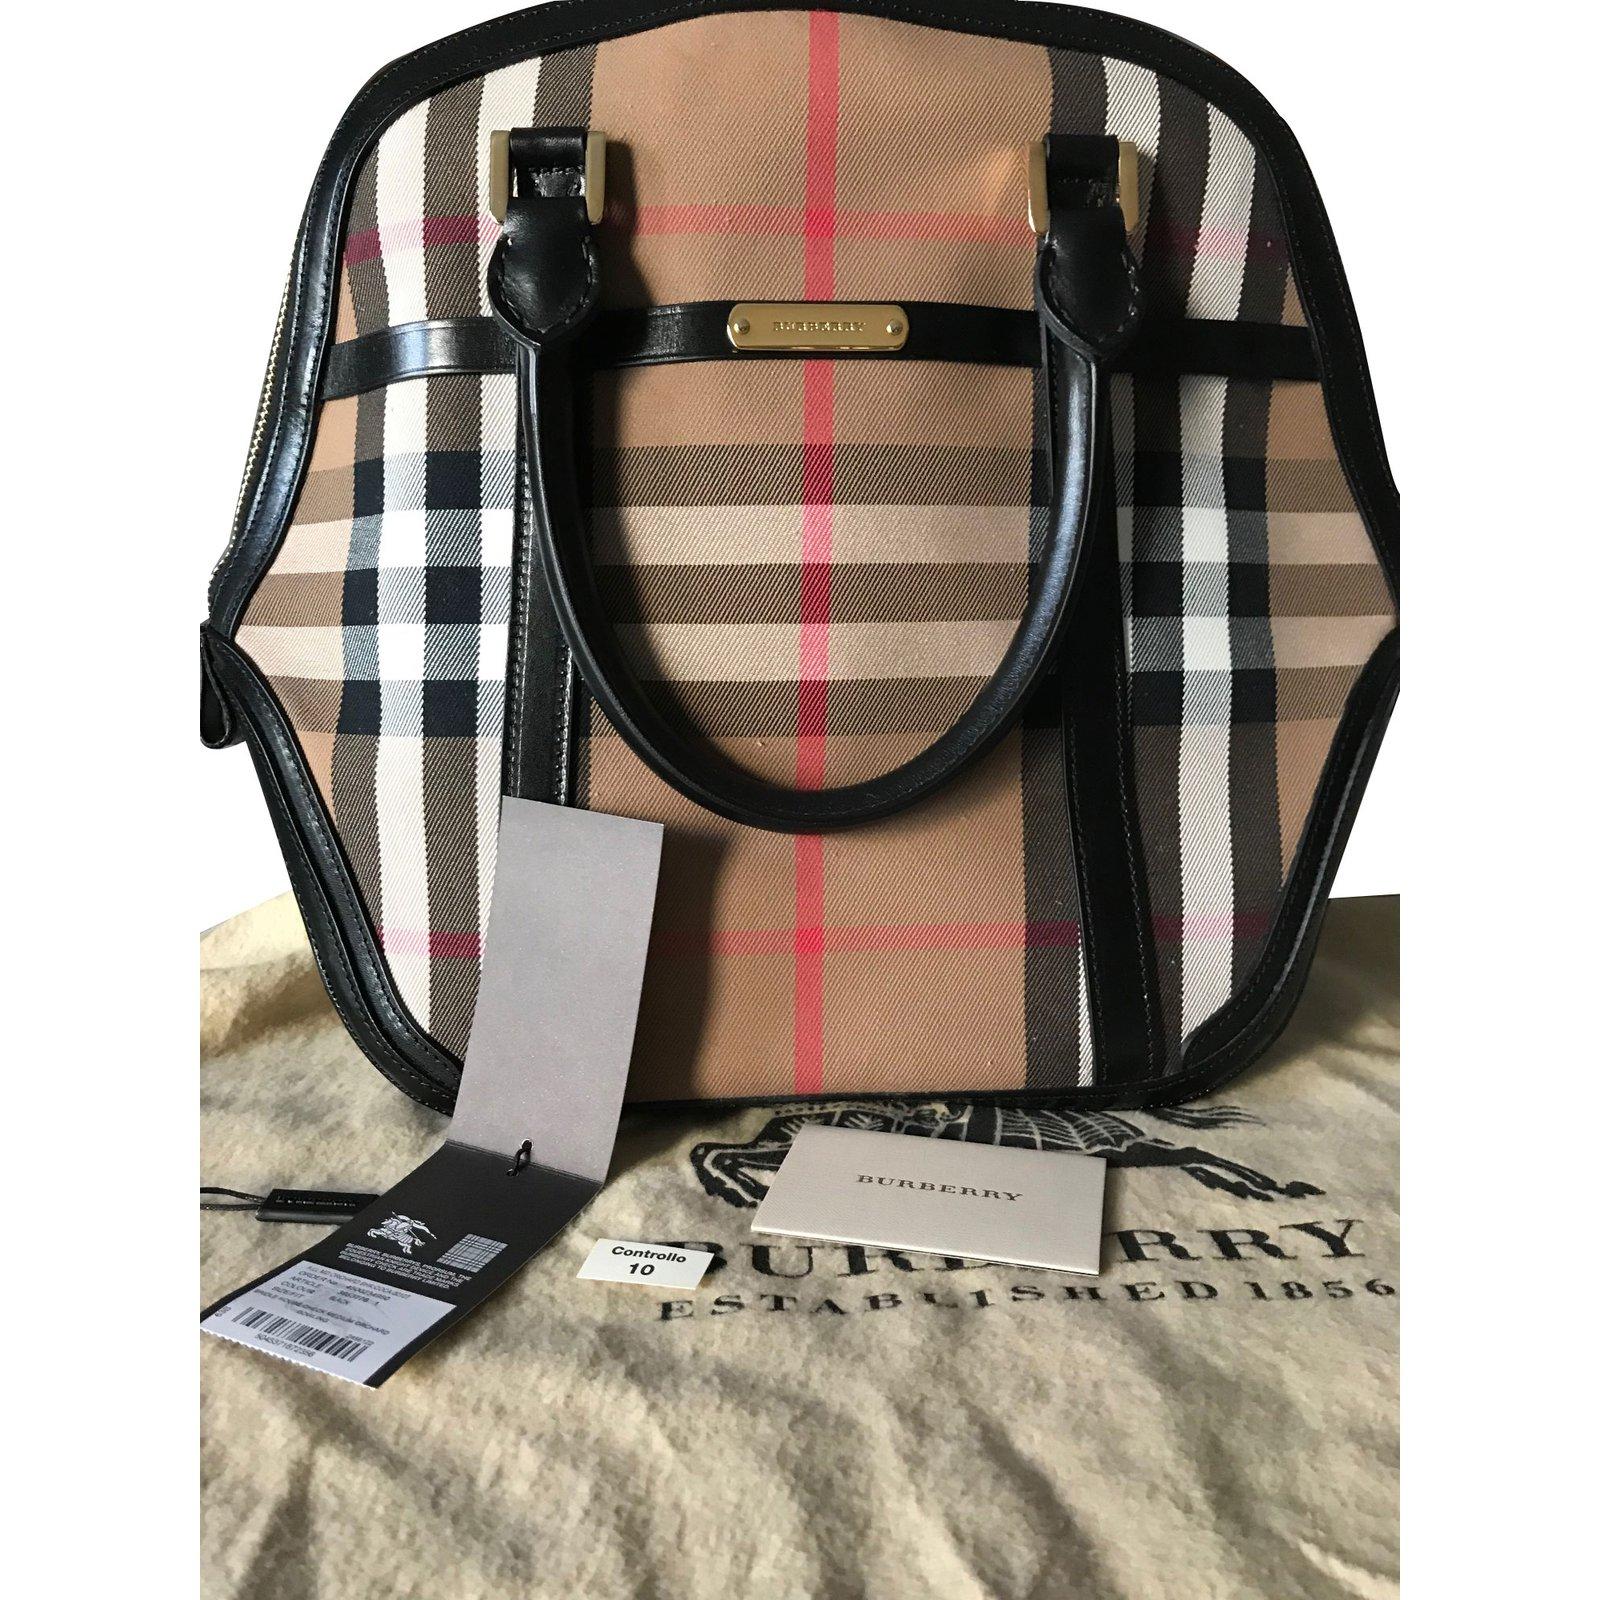 d9b03aba7f0 Burberry Medium Orchard Bag Handbags Leather,Other Black,Beige ref.86281